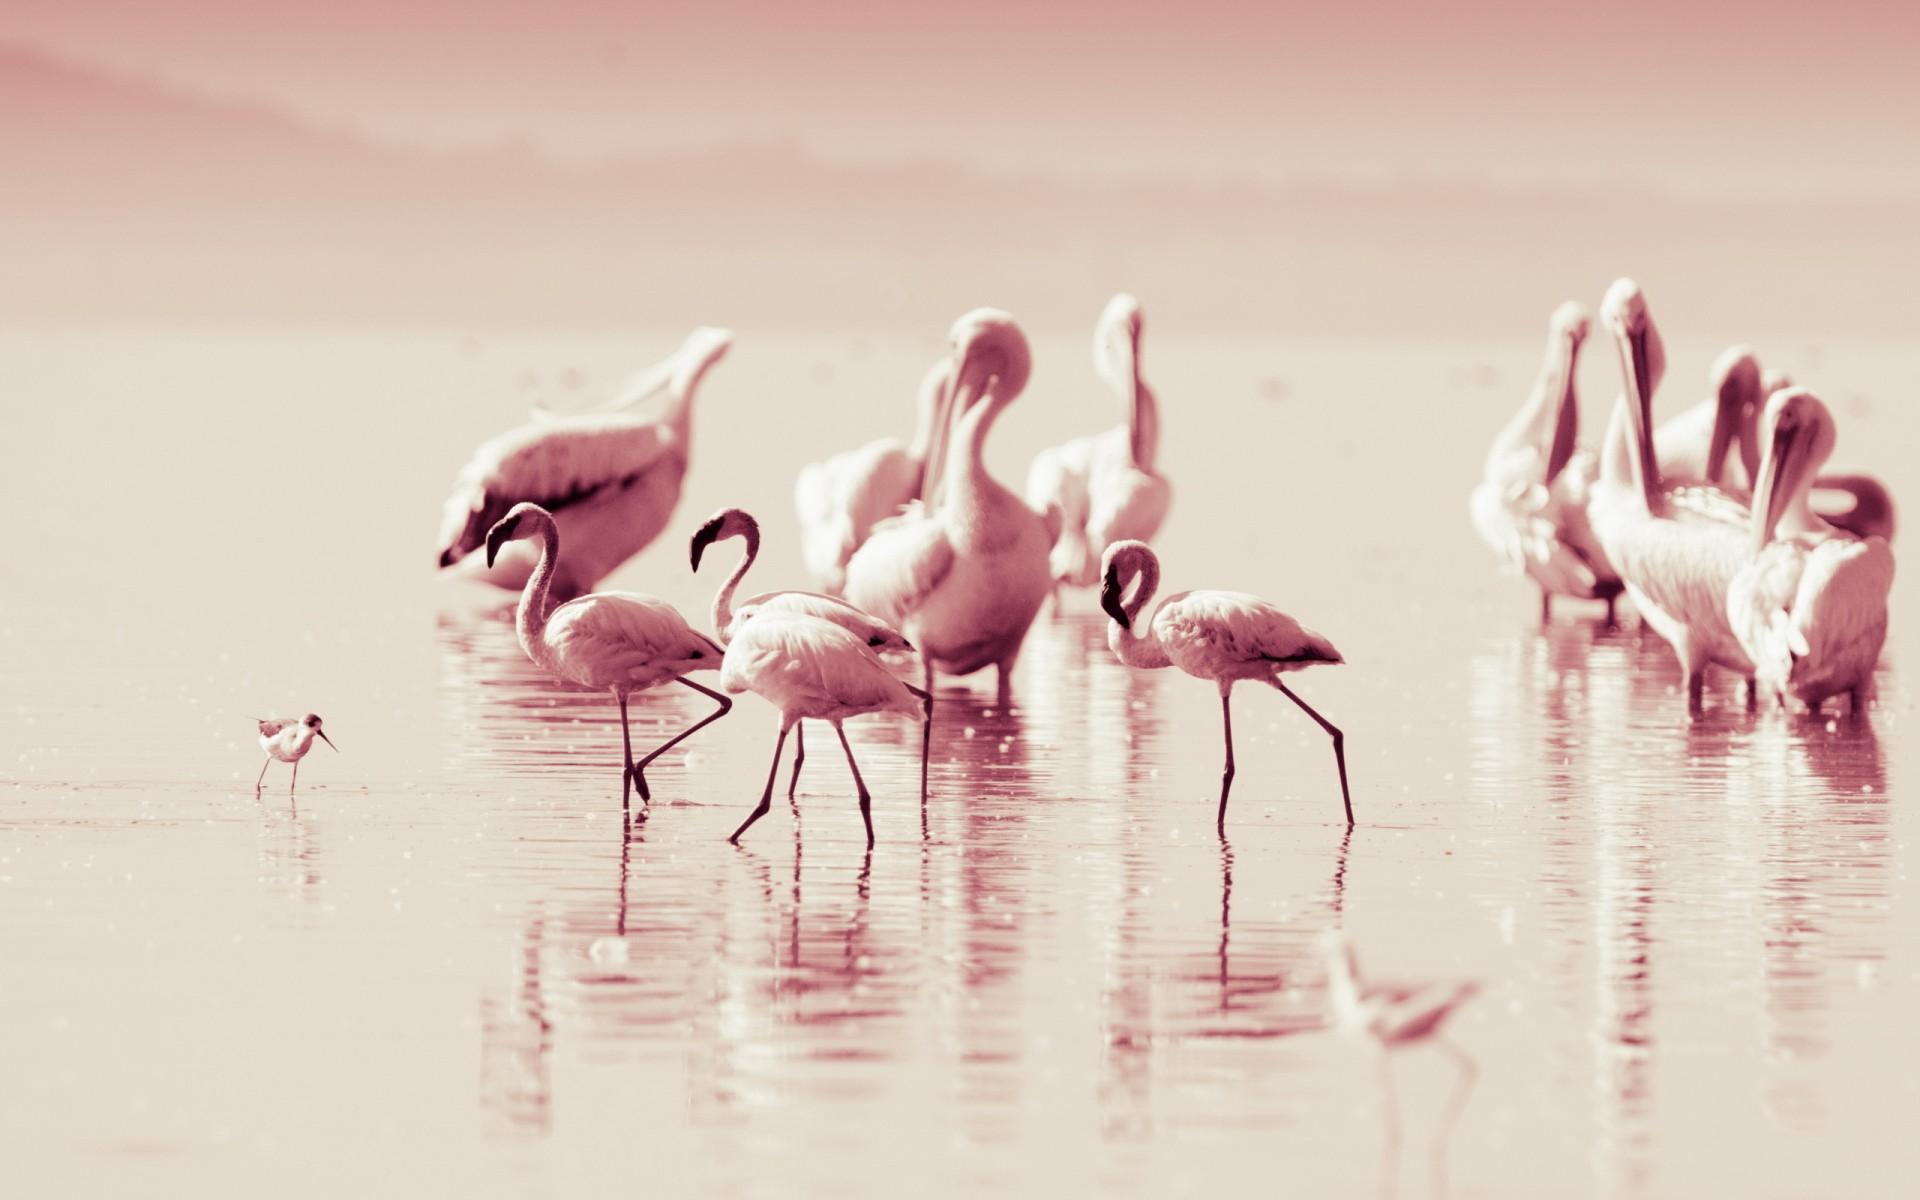 Www 3d Wallpaper Download Com Flamingo Lakes Reflection Water Pink Wallpaper 1920x1200